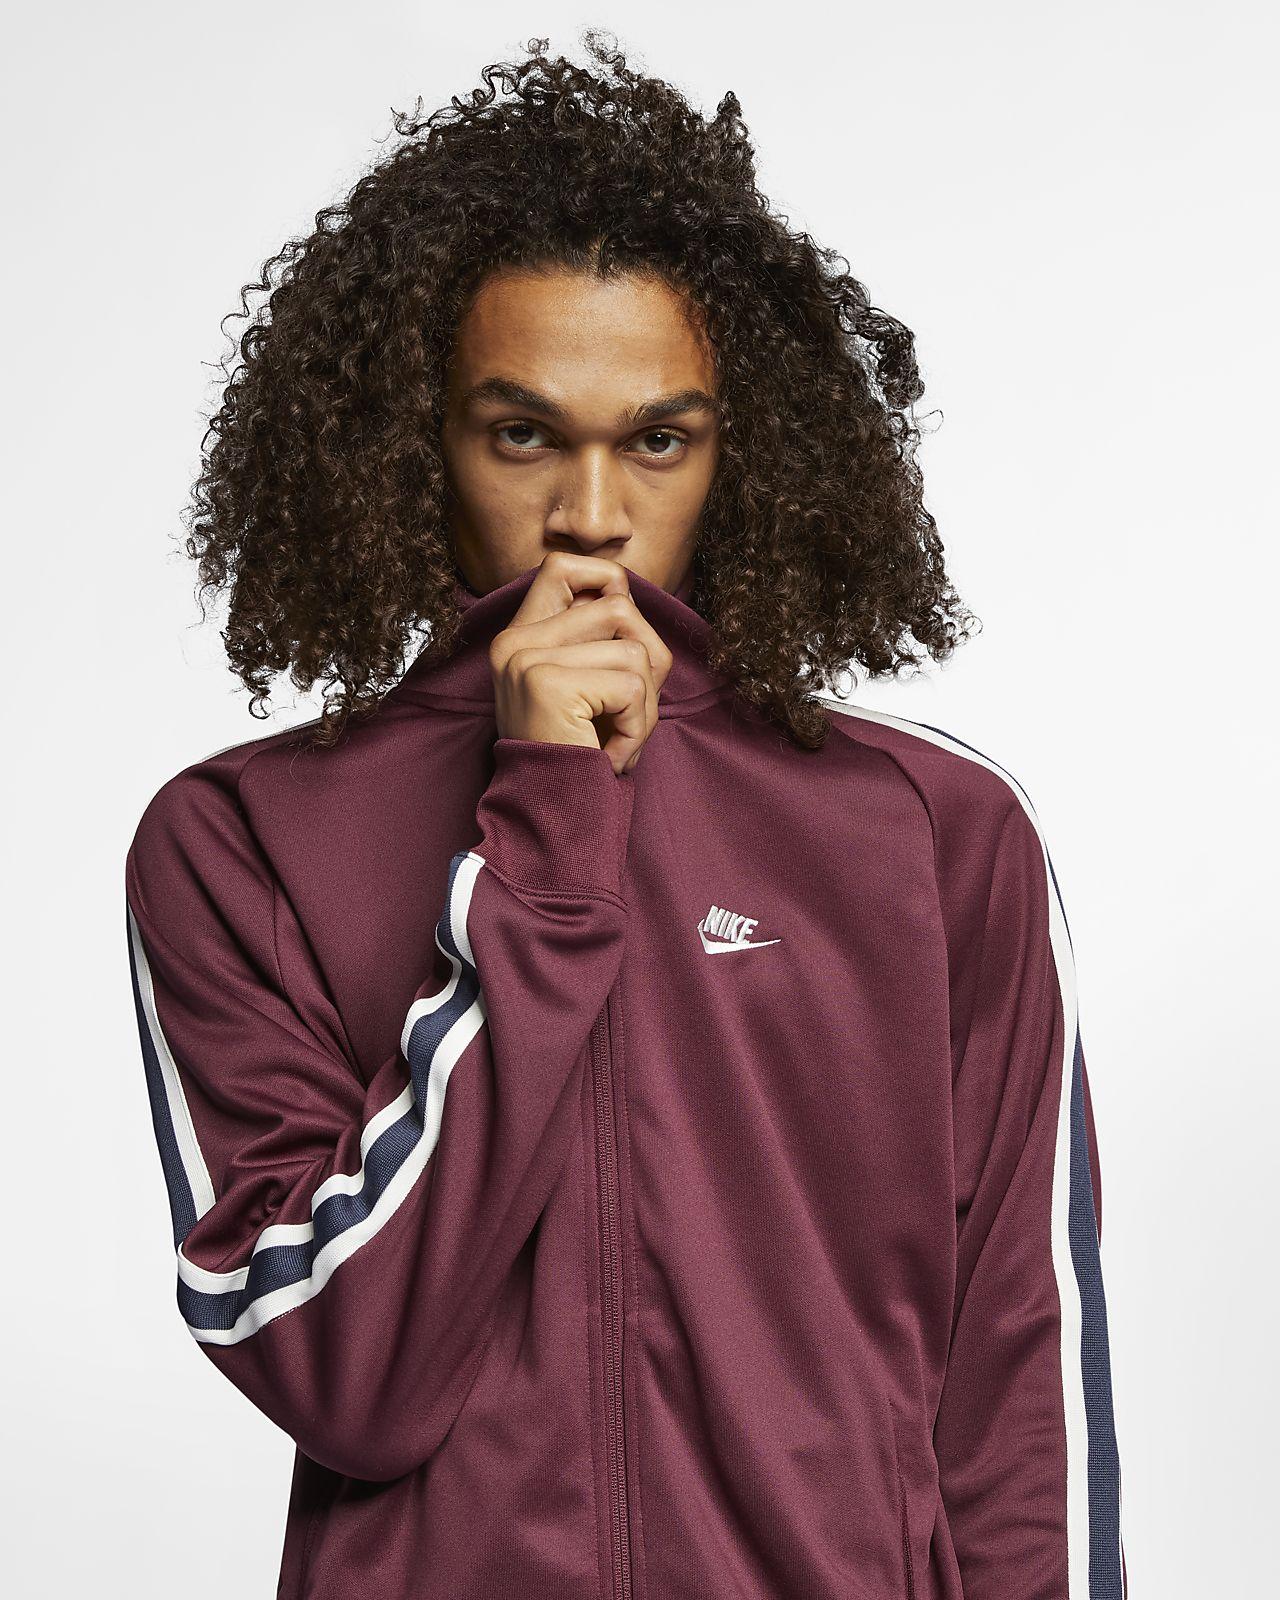 Nike Sportswear N98 Örgü Erkek Isınma Ceketi